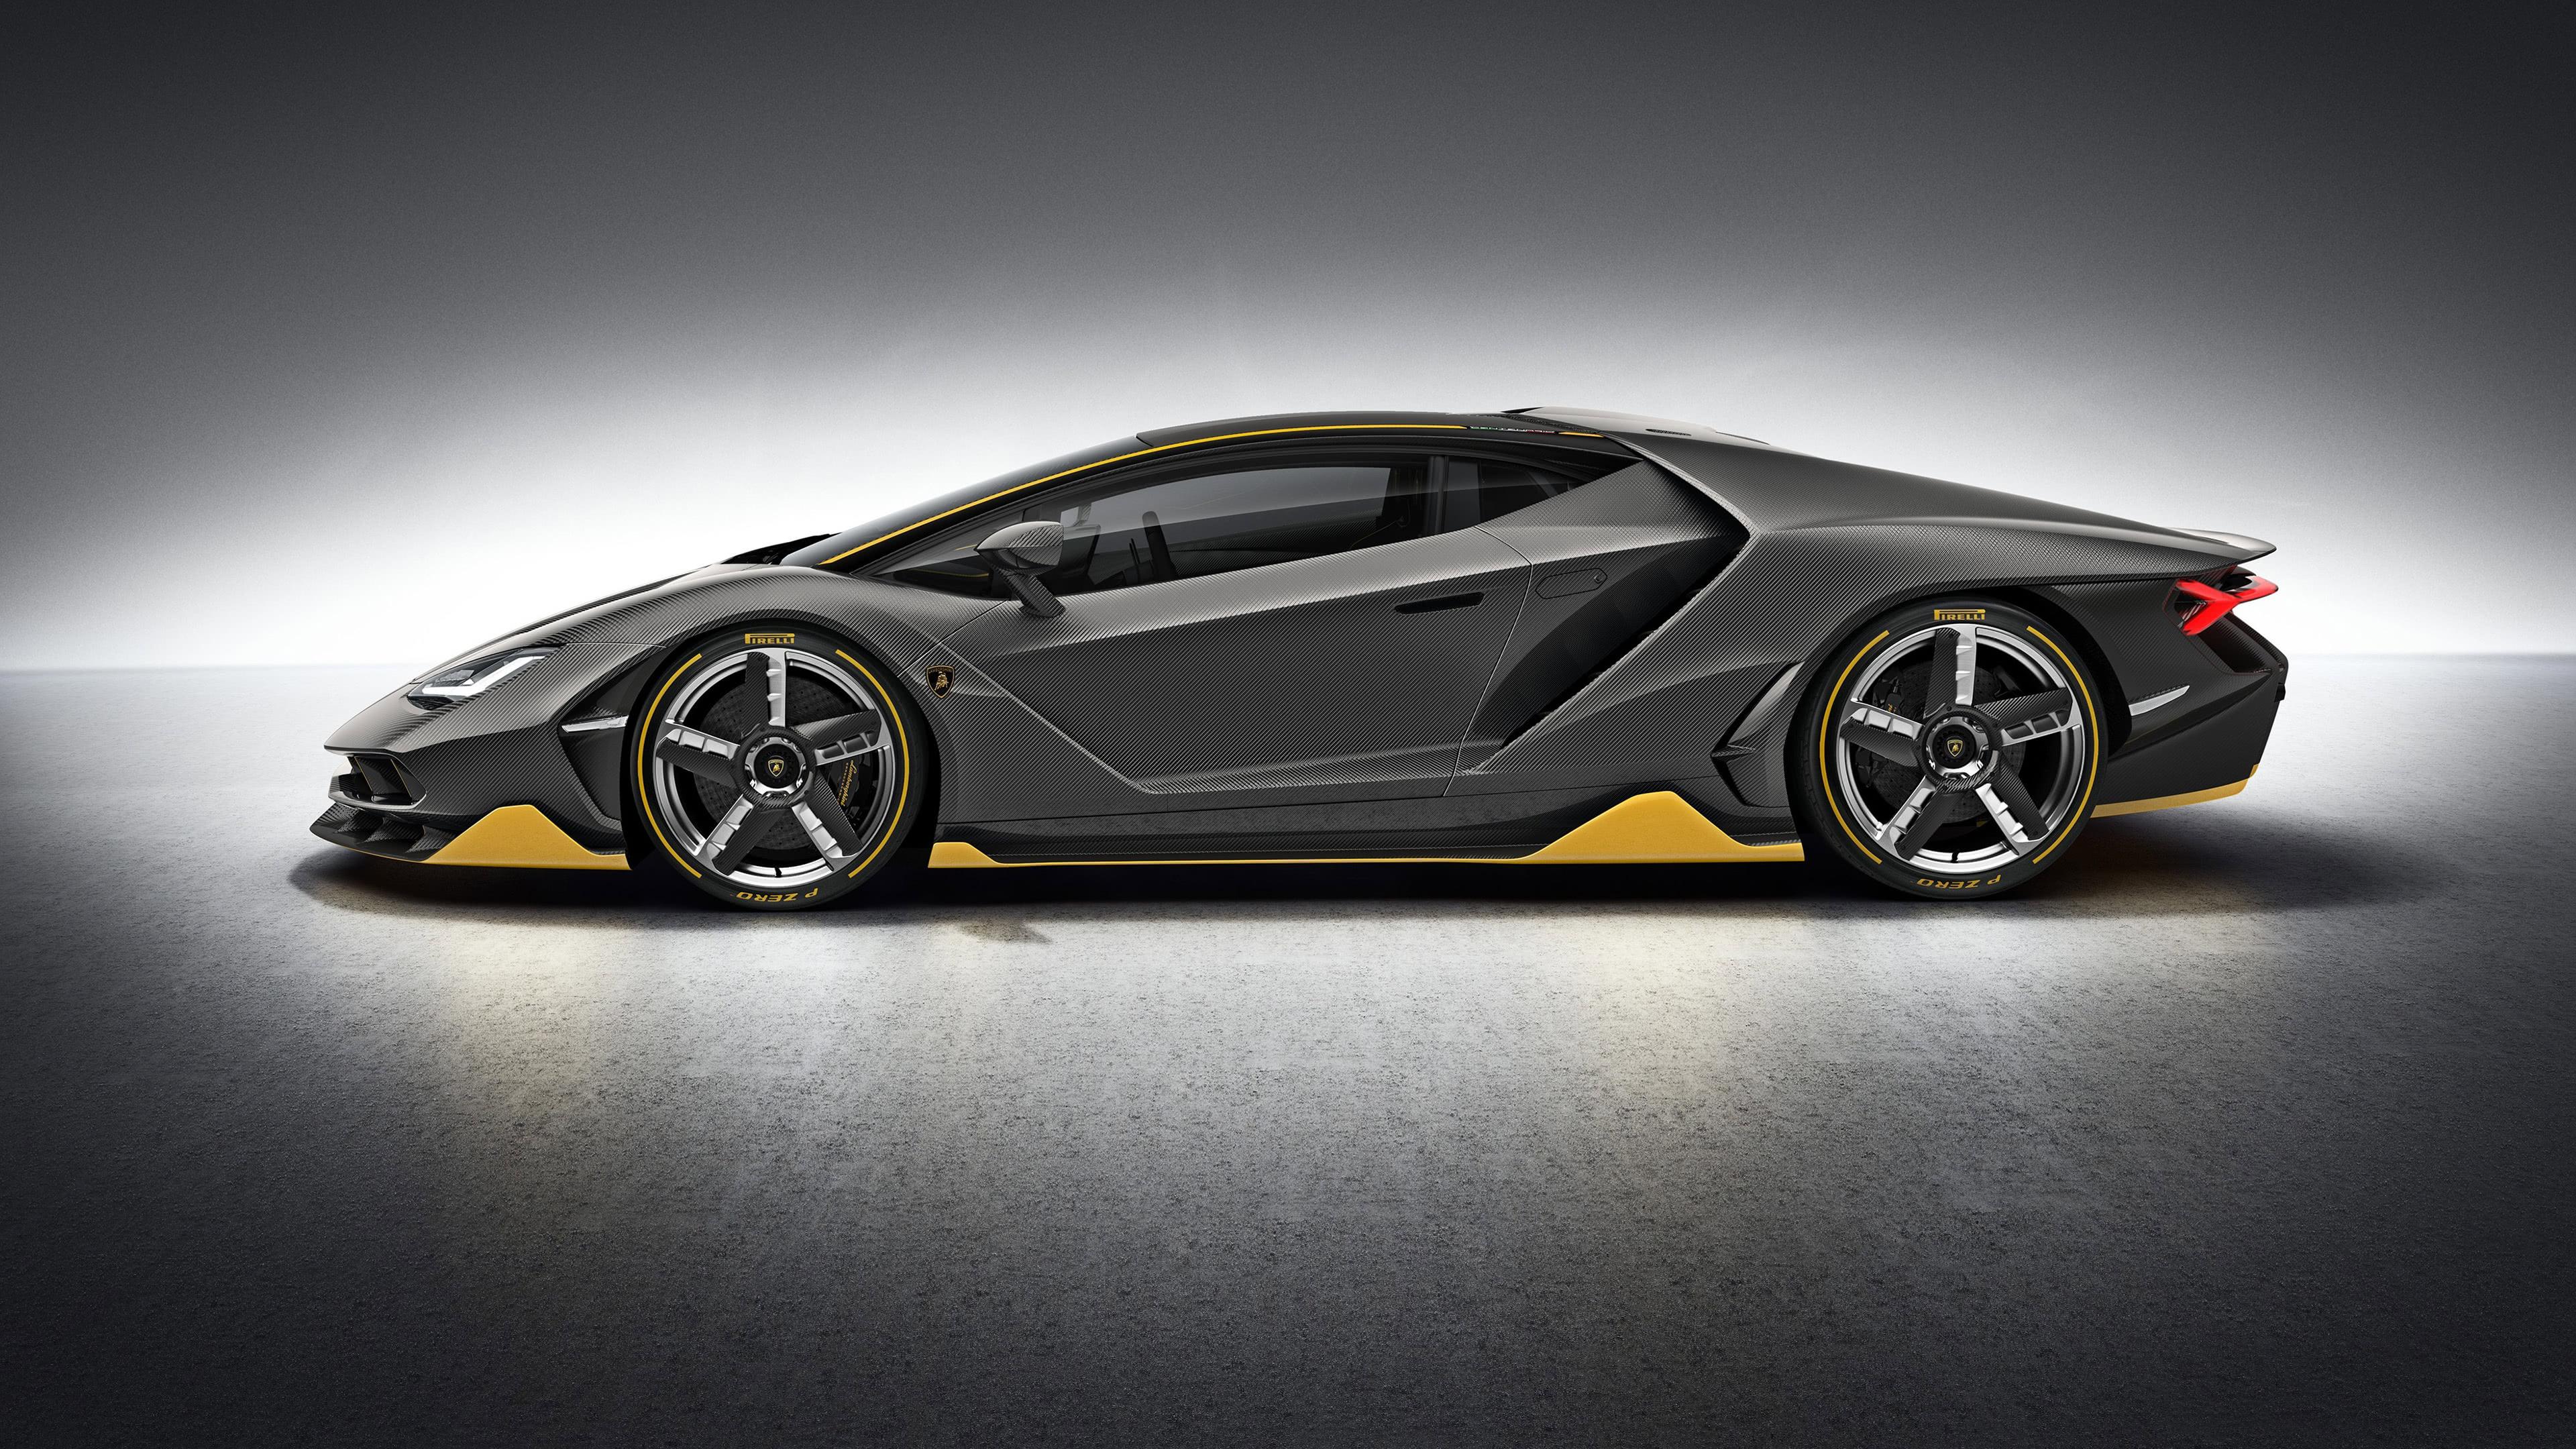 Lamborghini Centenario Side Uhd 4k Wallpaper Pixelz